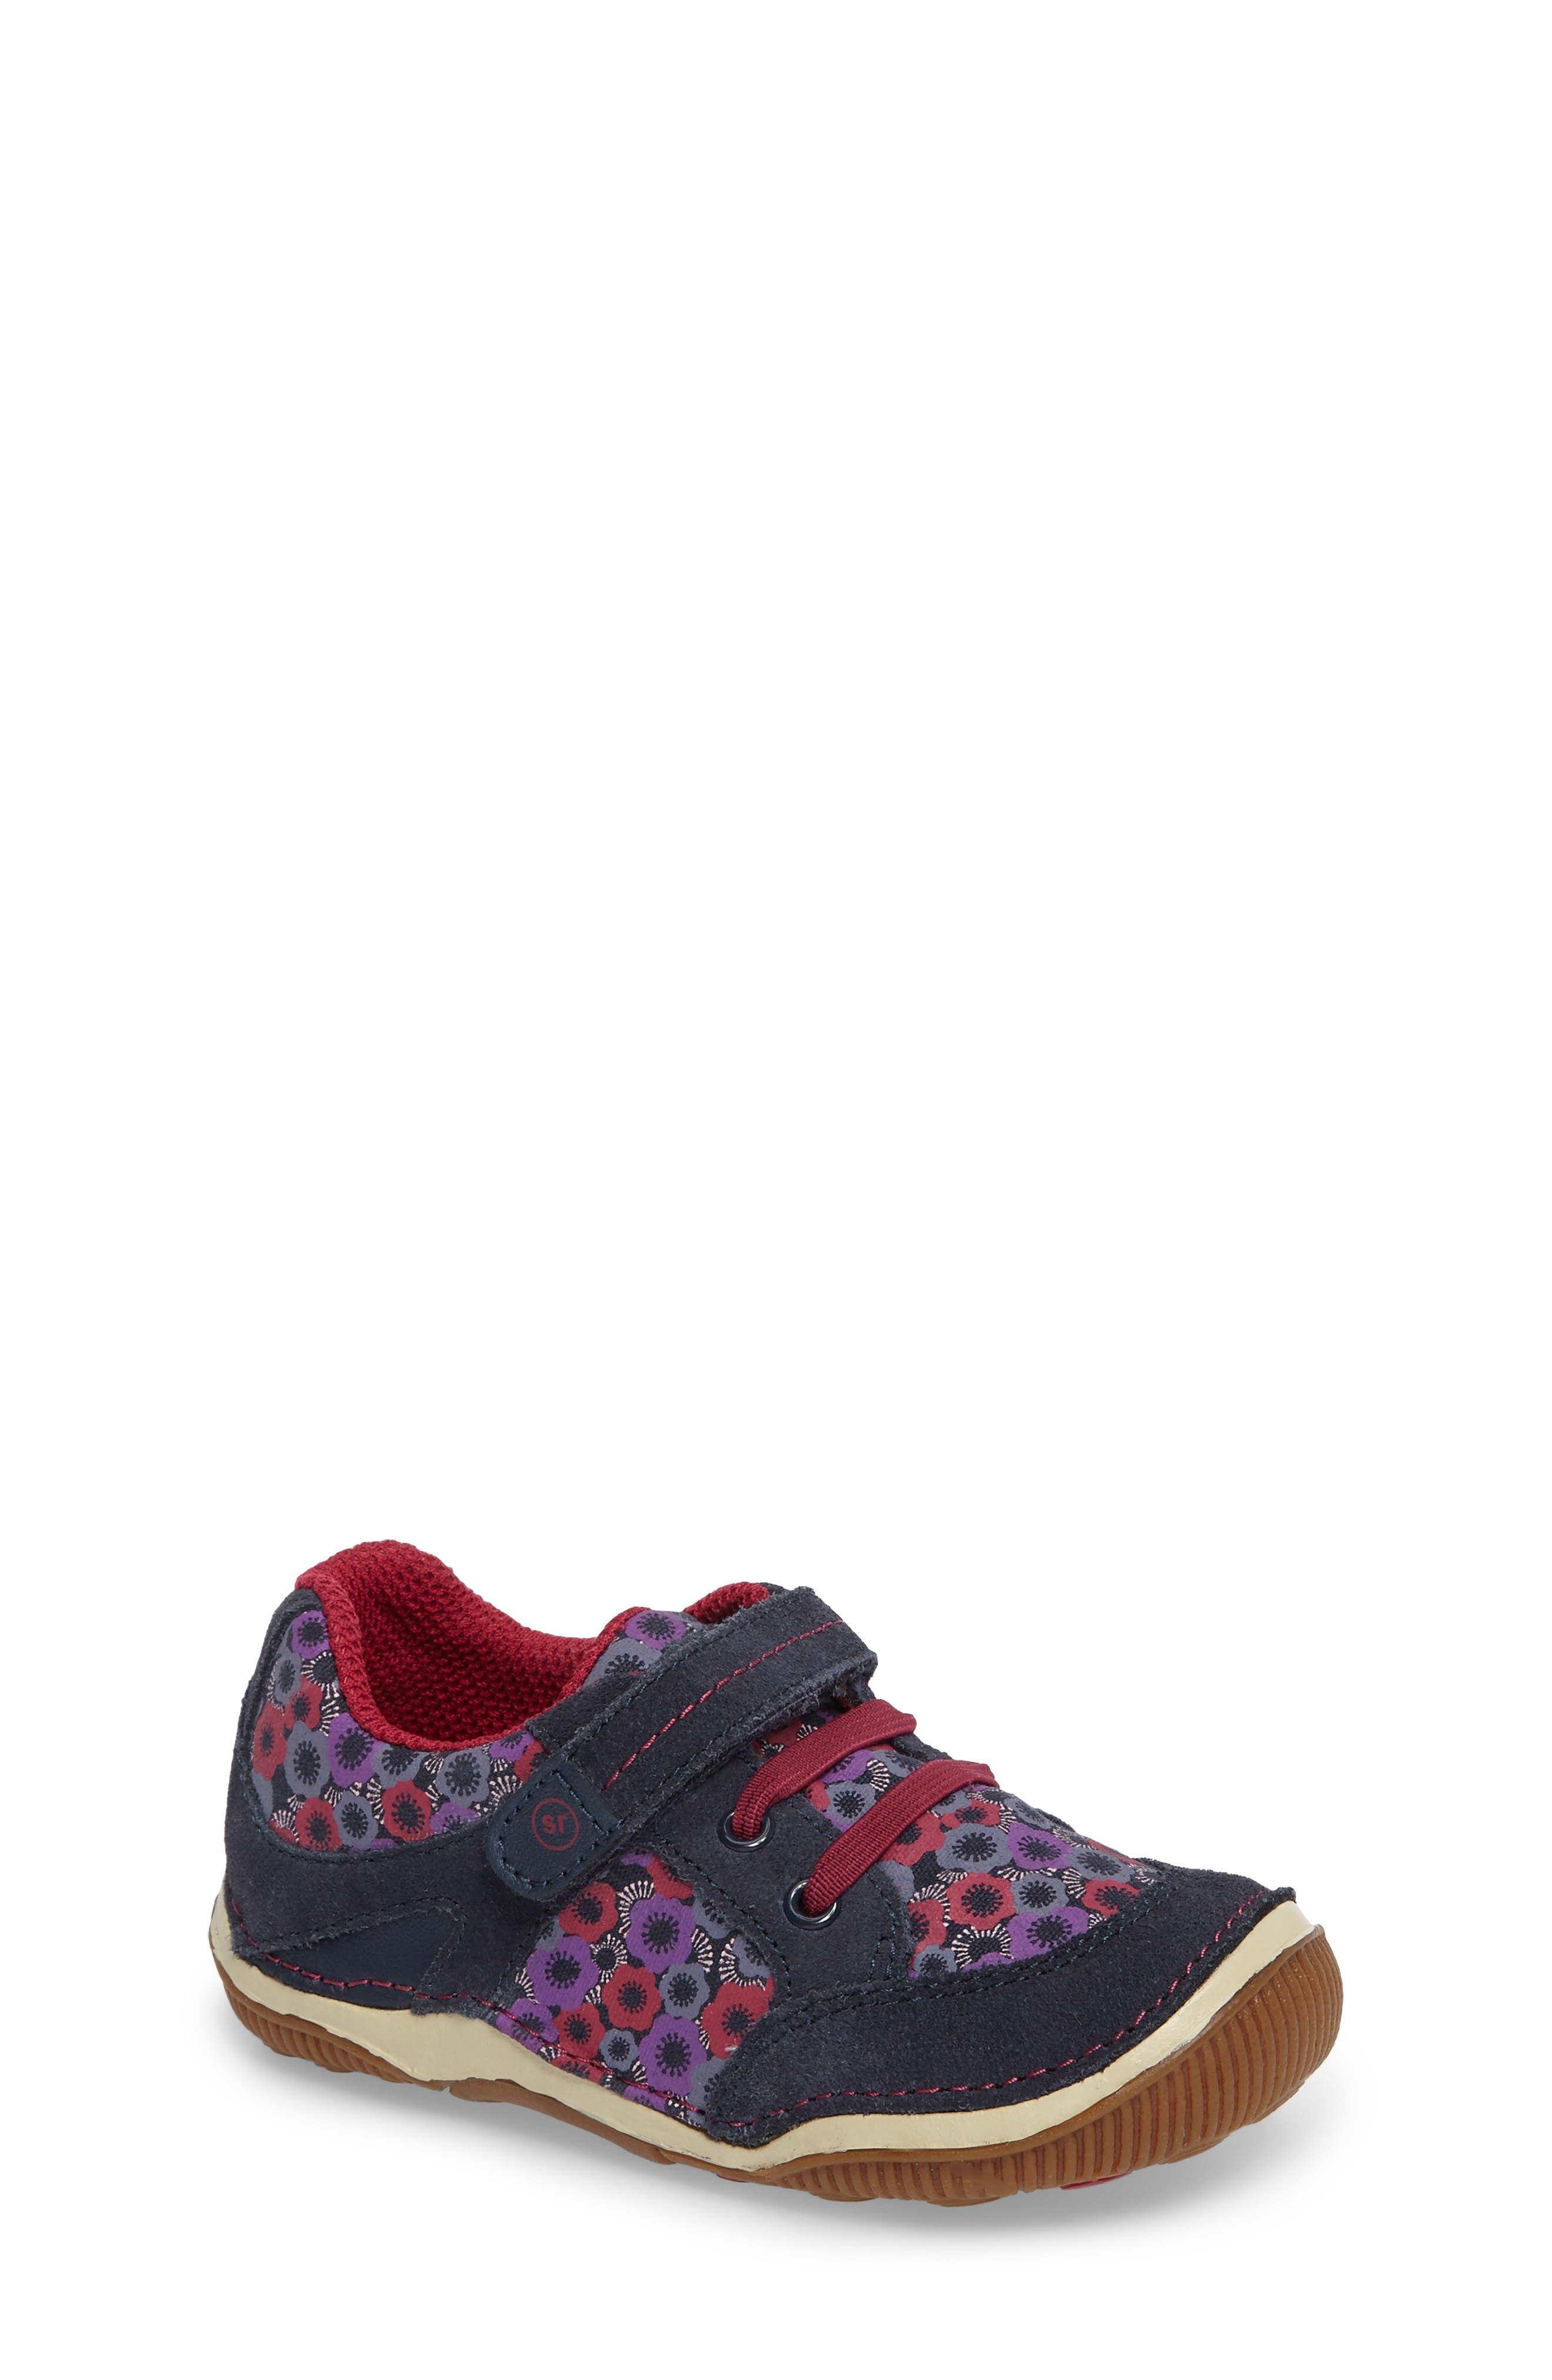 Armorie Flower Print Sneaker,                             Main thumbnail 1, color,                             Navy